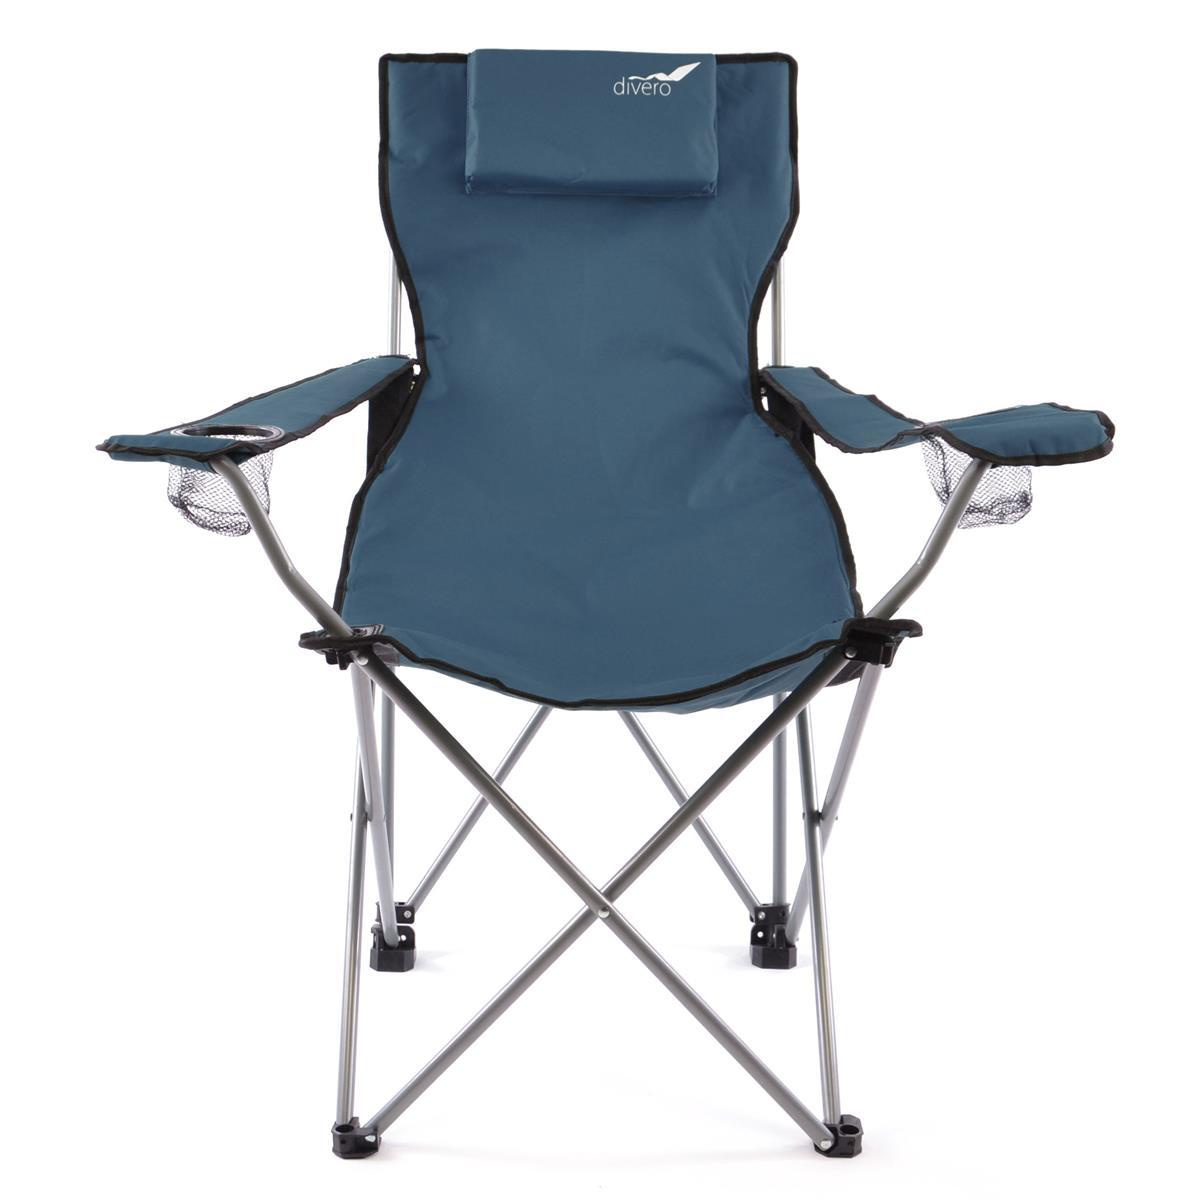 Divero Camping Stuhl Faltstuhl Angelstuhl dunkelblau Kopfkissen Getränke robust